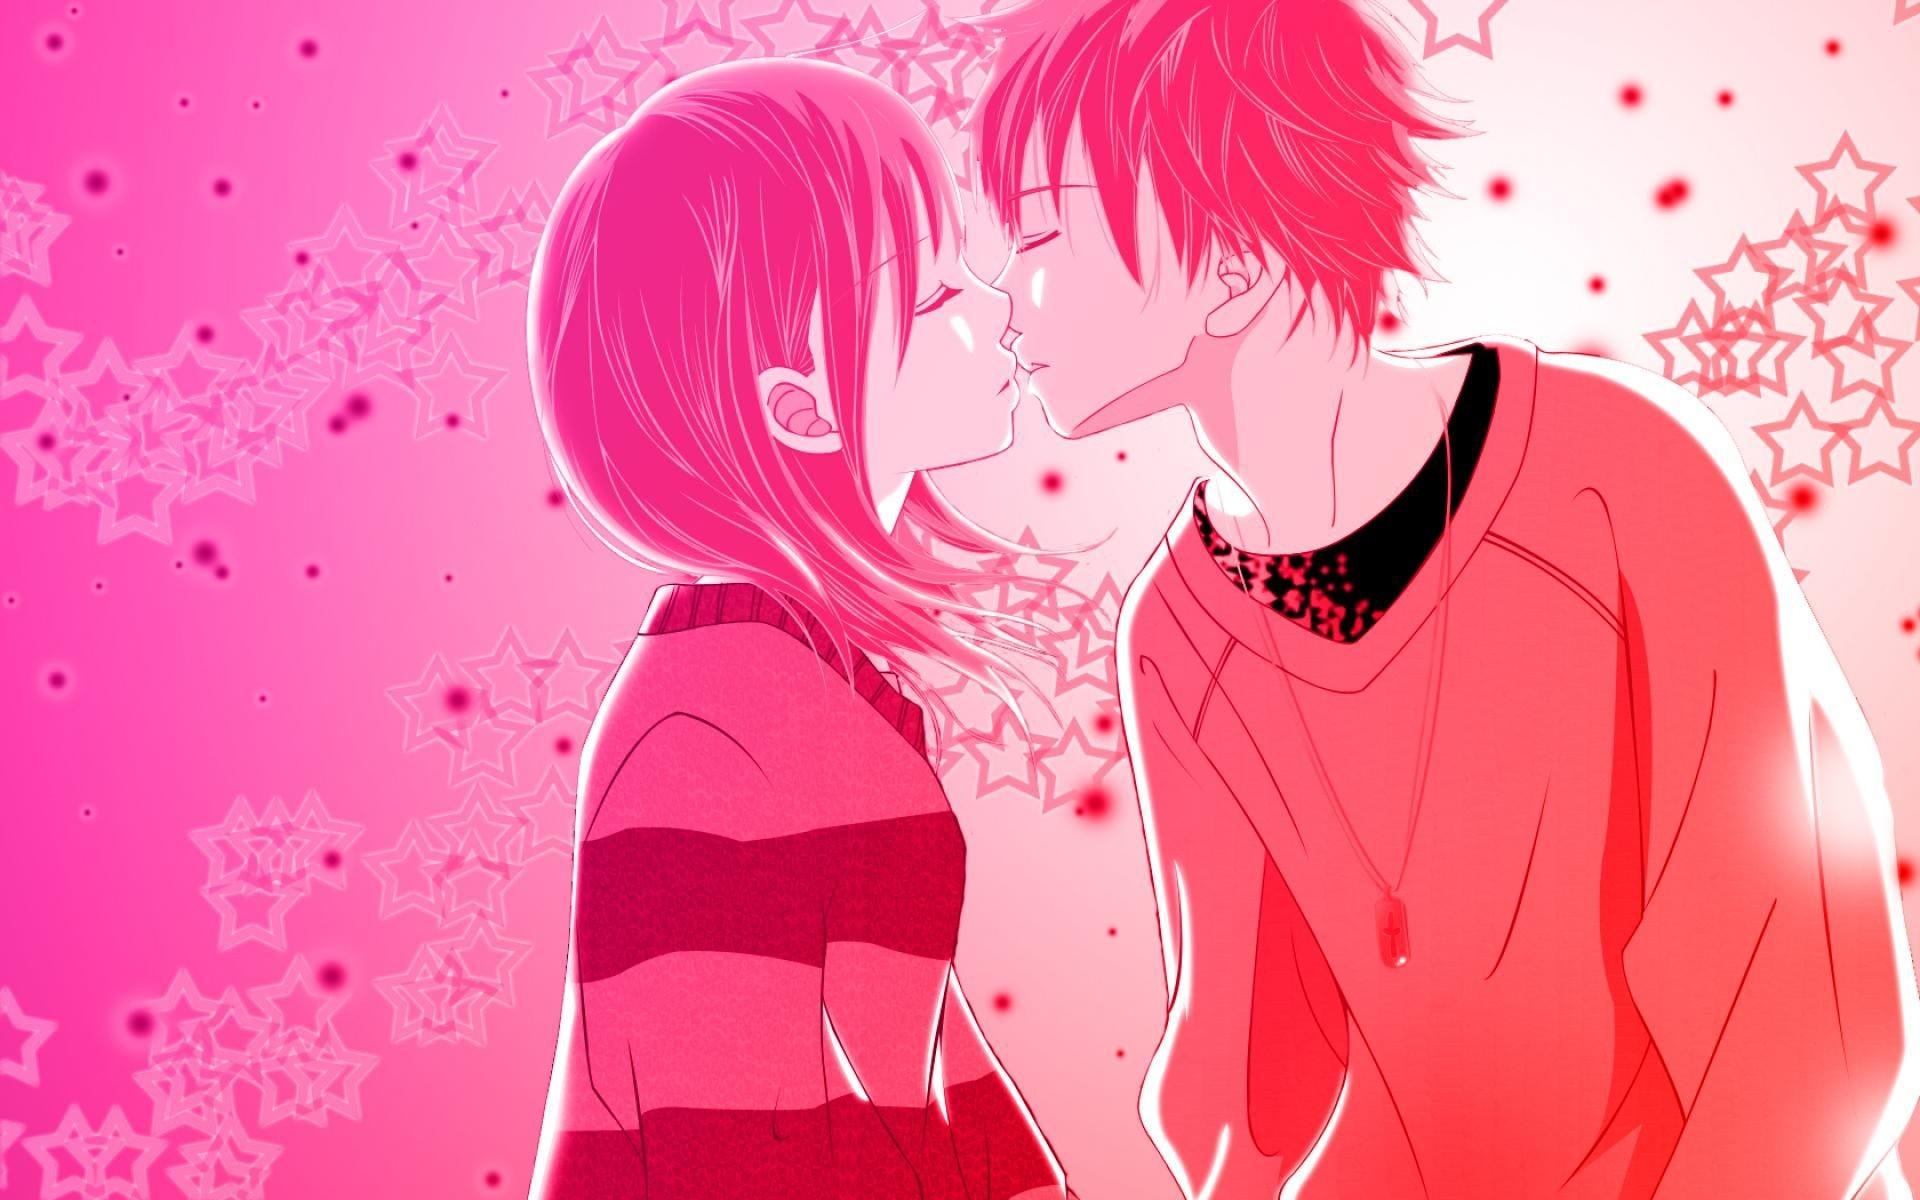 love anime kiss pink wallpaper